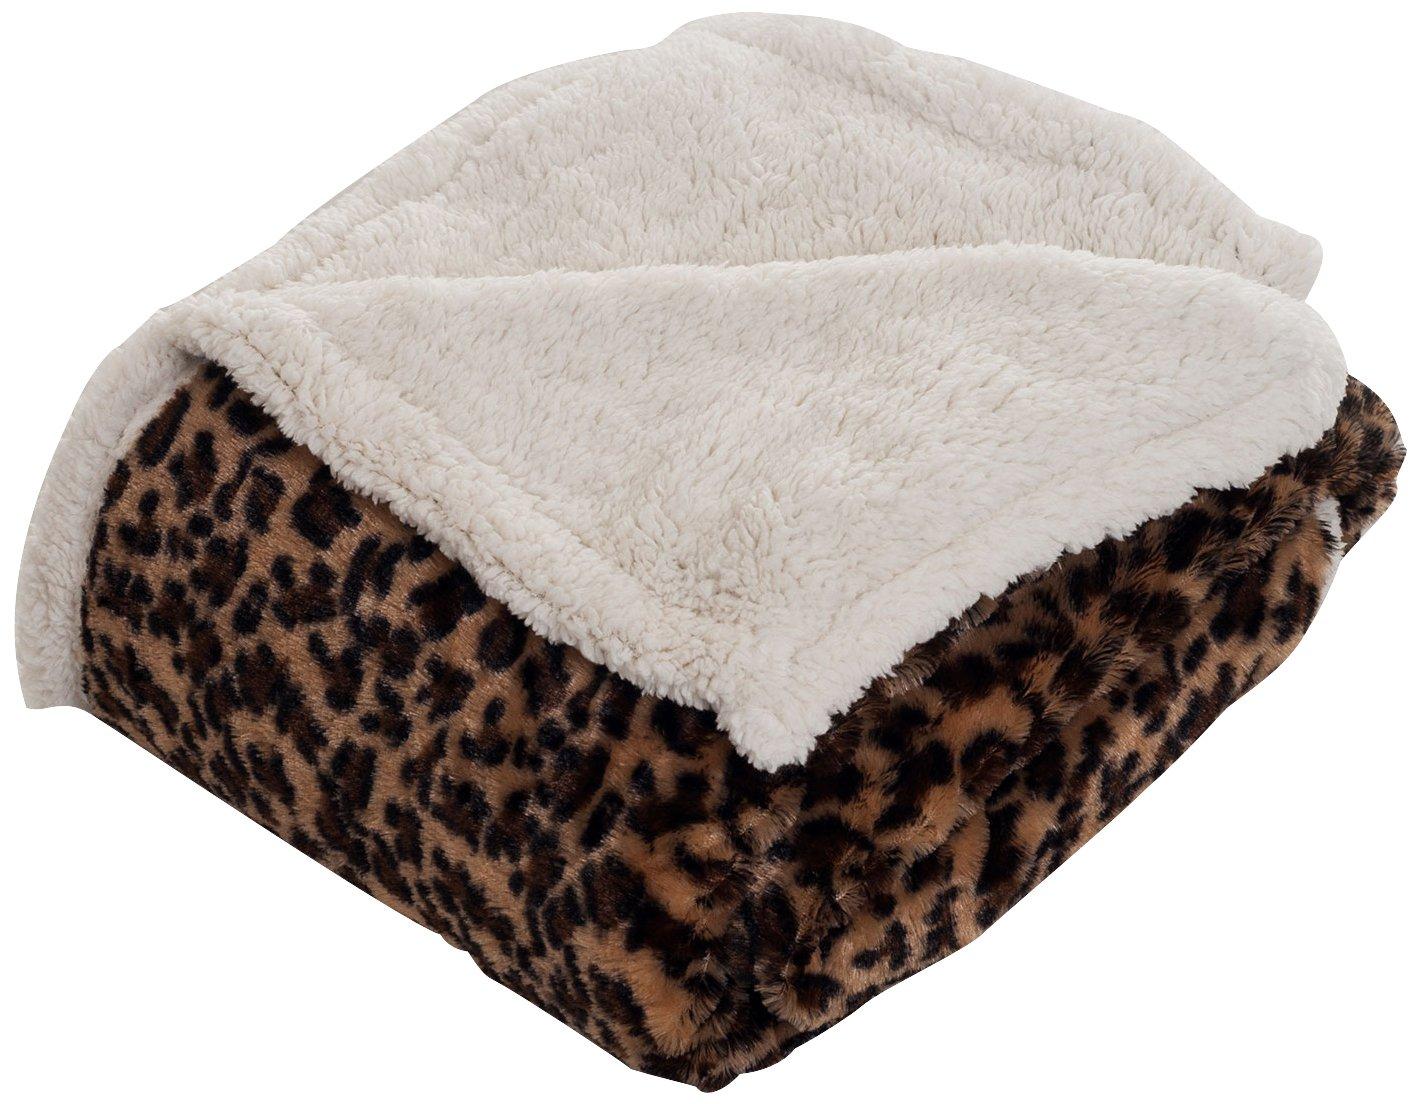 Lavish Home Throw Blanket, Fleece/Sherpa, Leopard